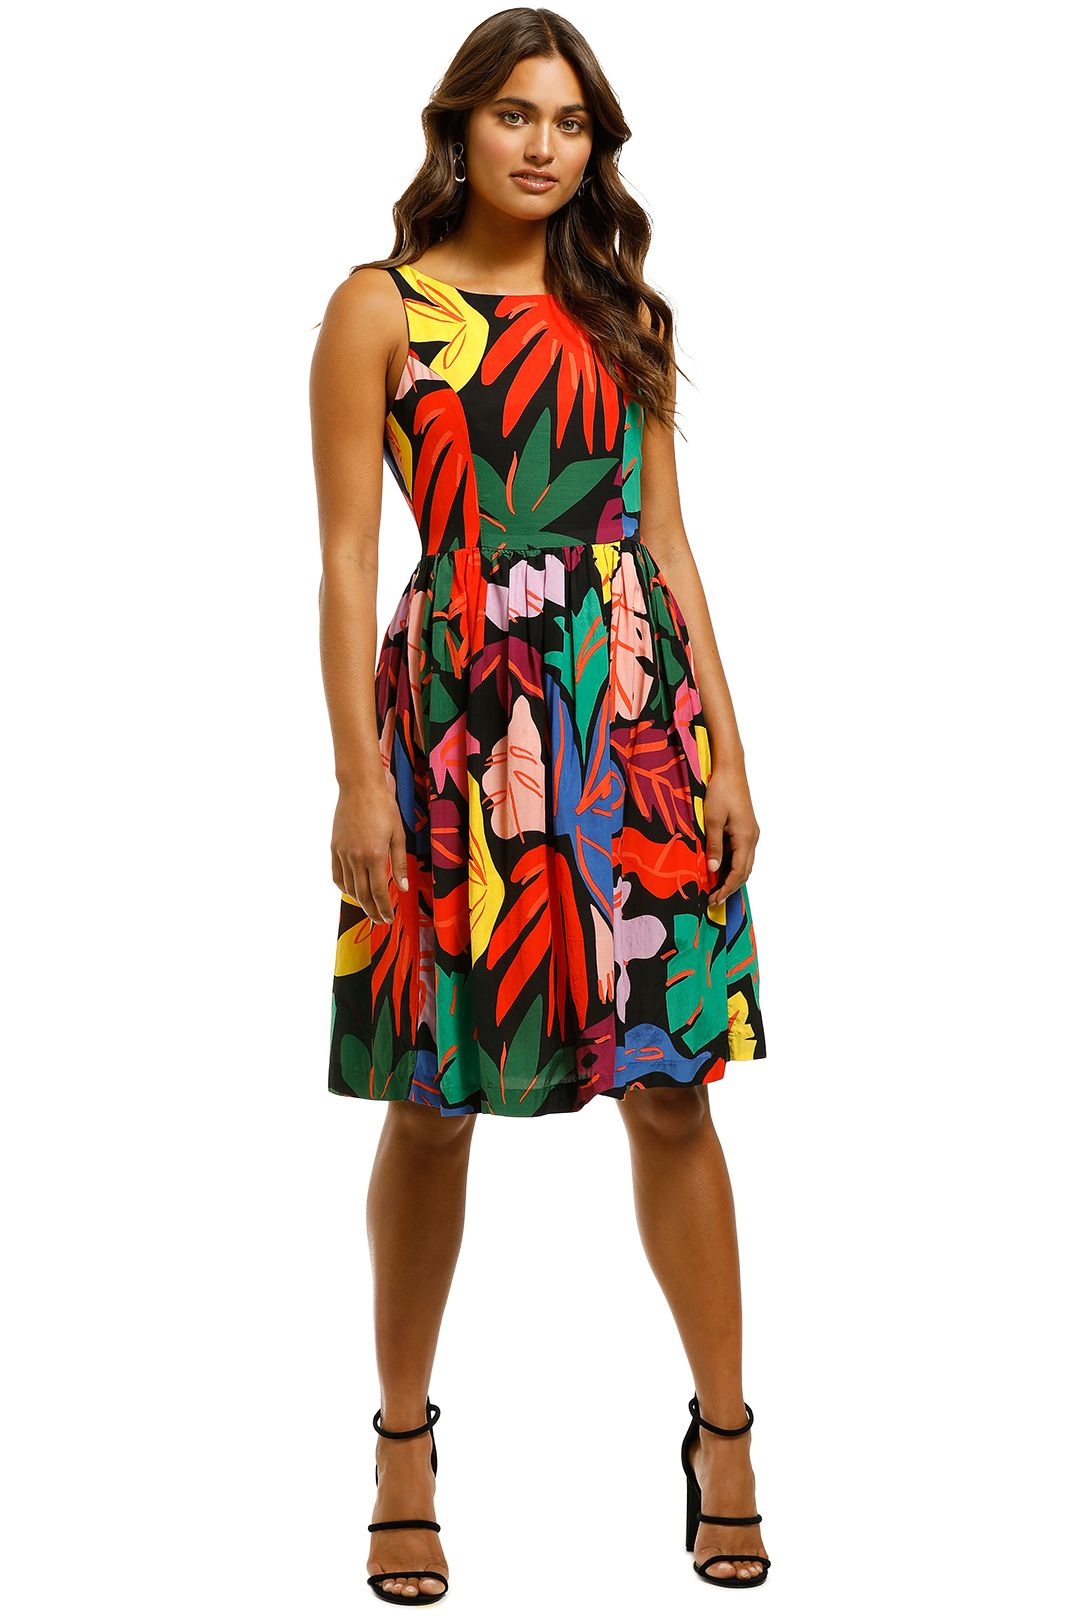 Gorman - Frondsense Dress - Multi - Front